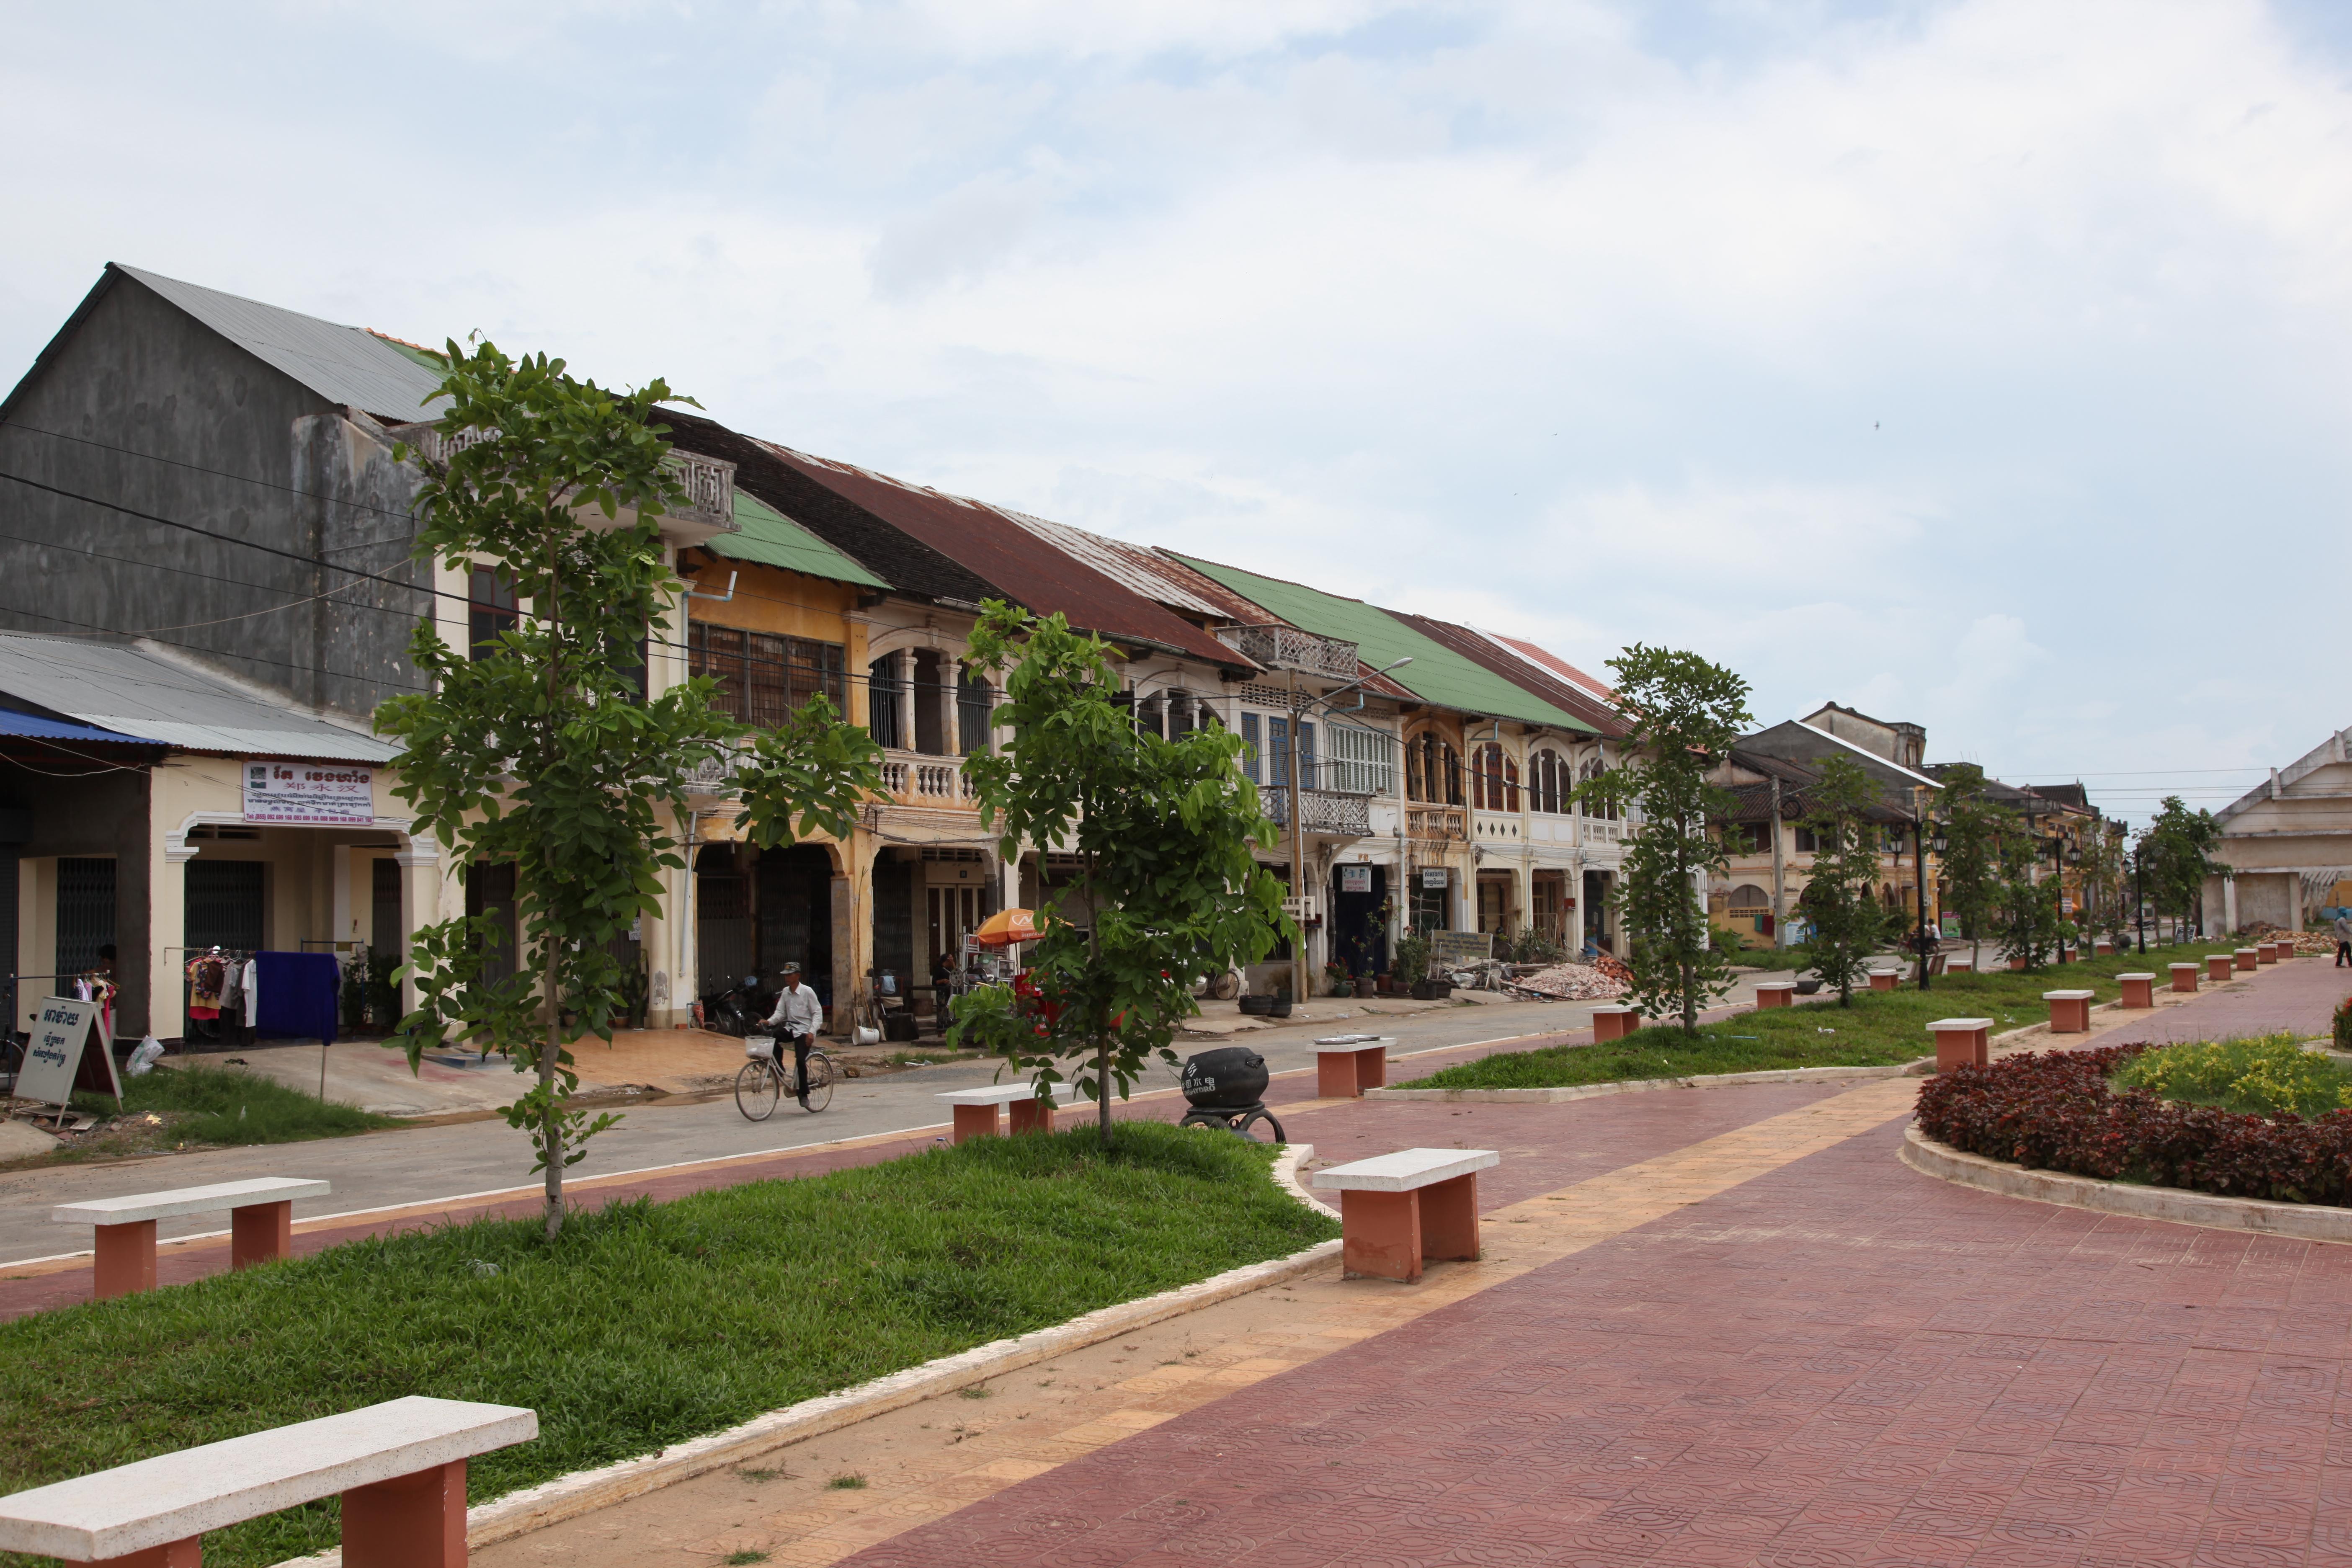 A-main-street-in-kampot